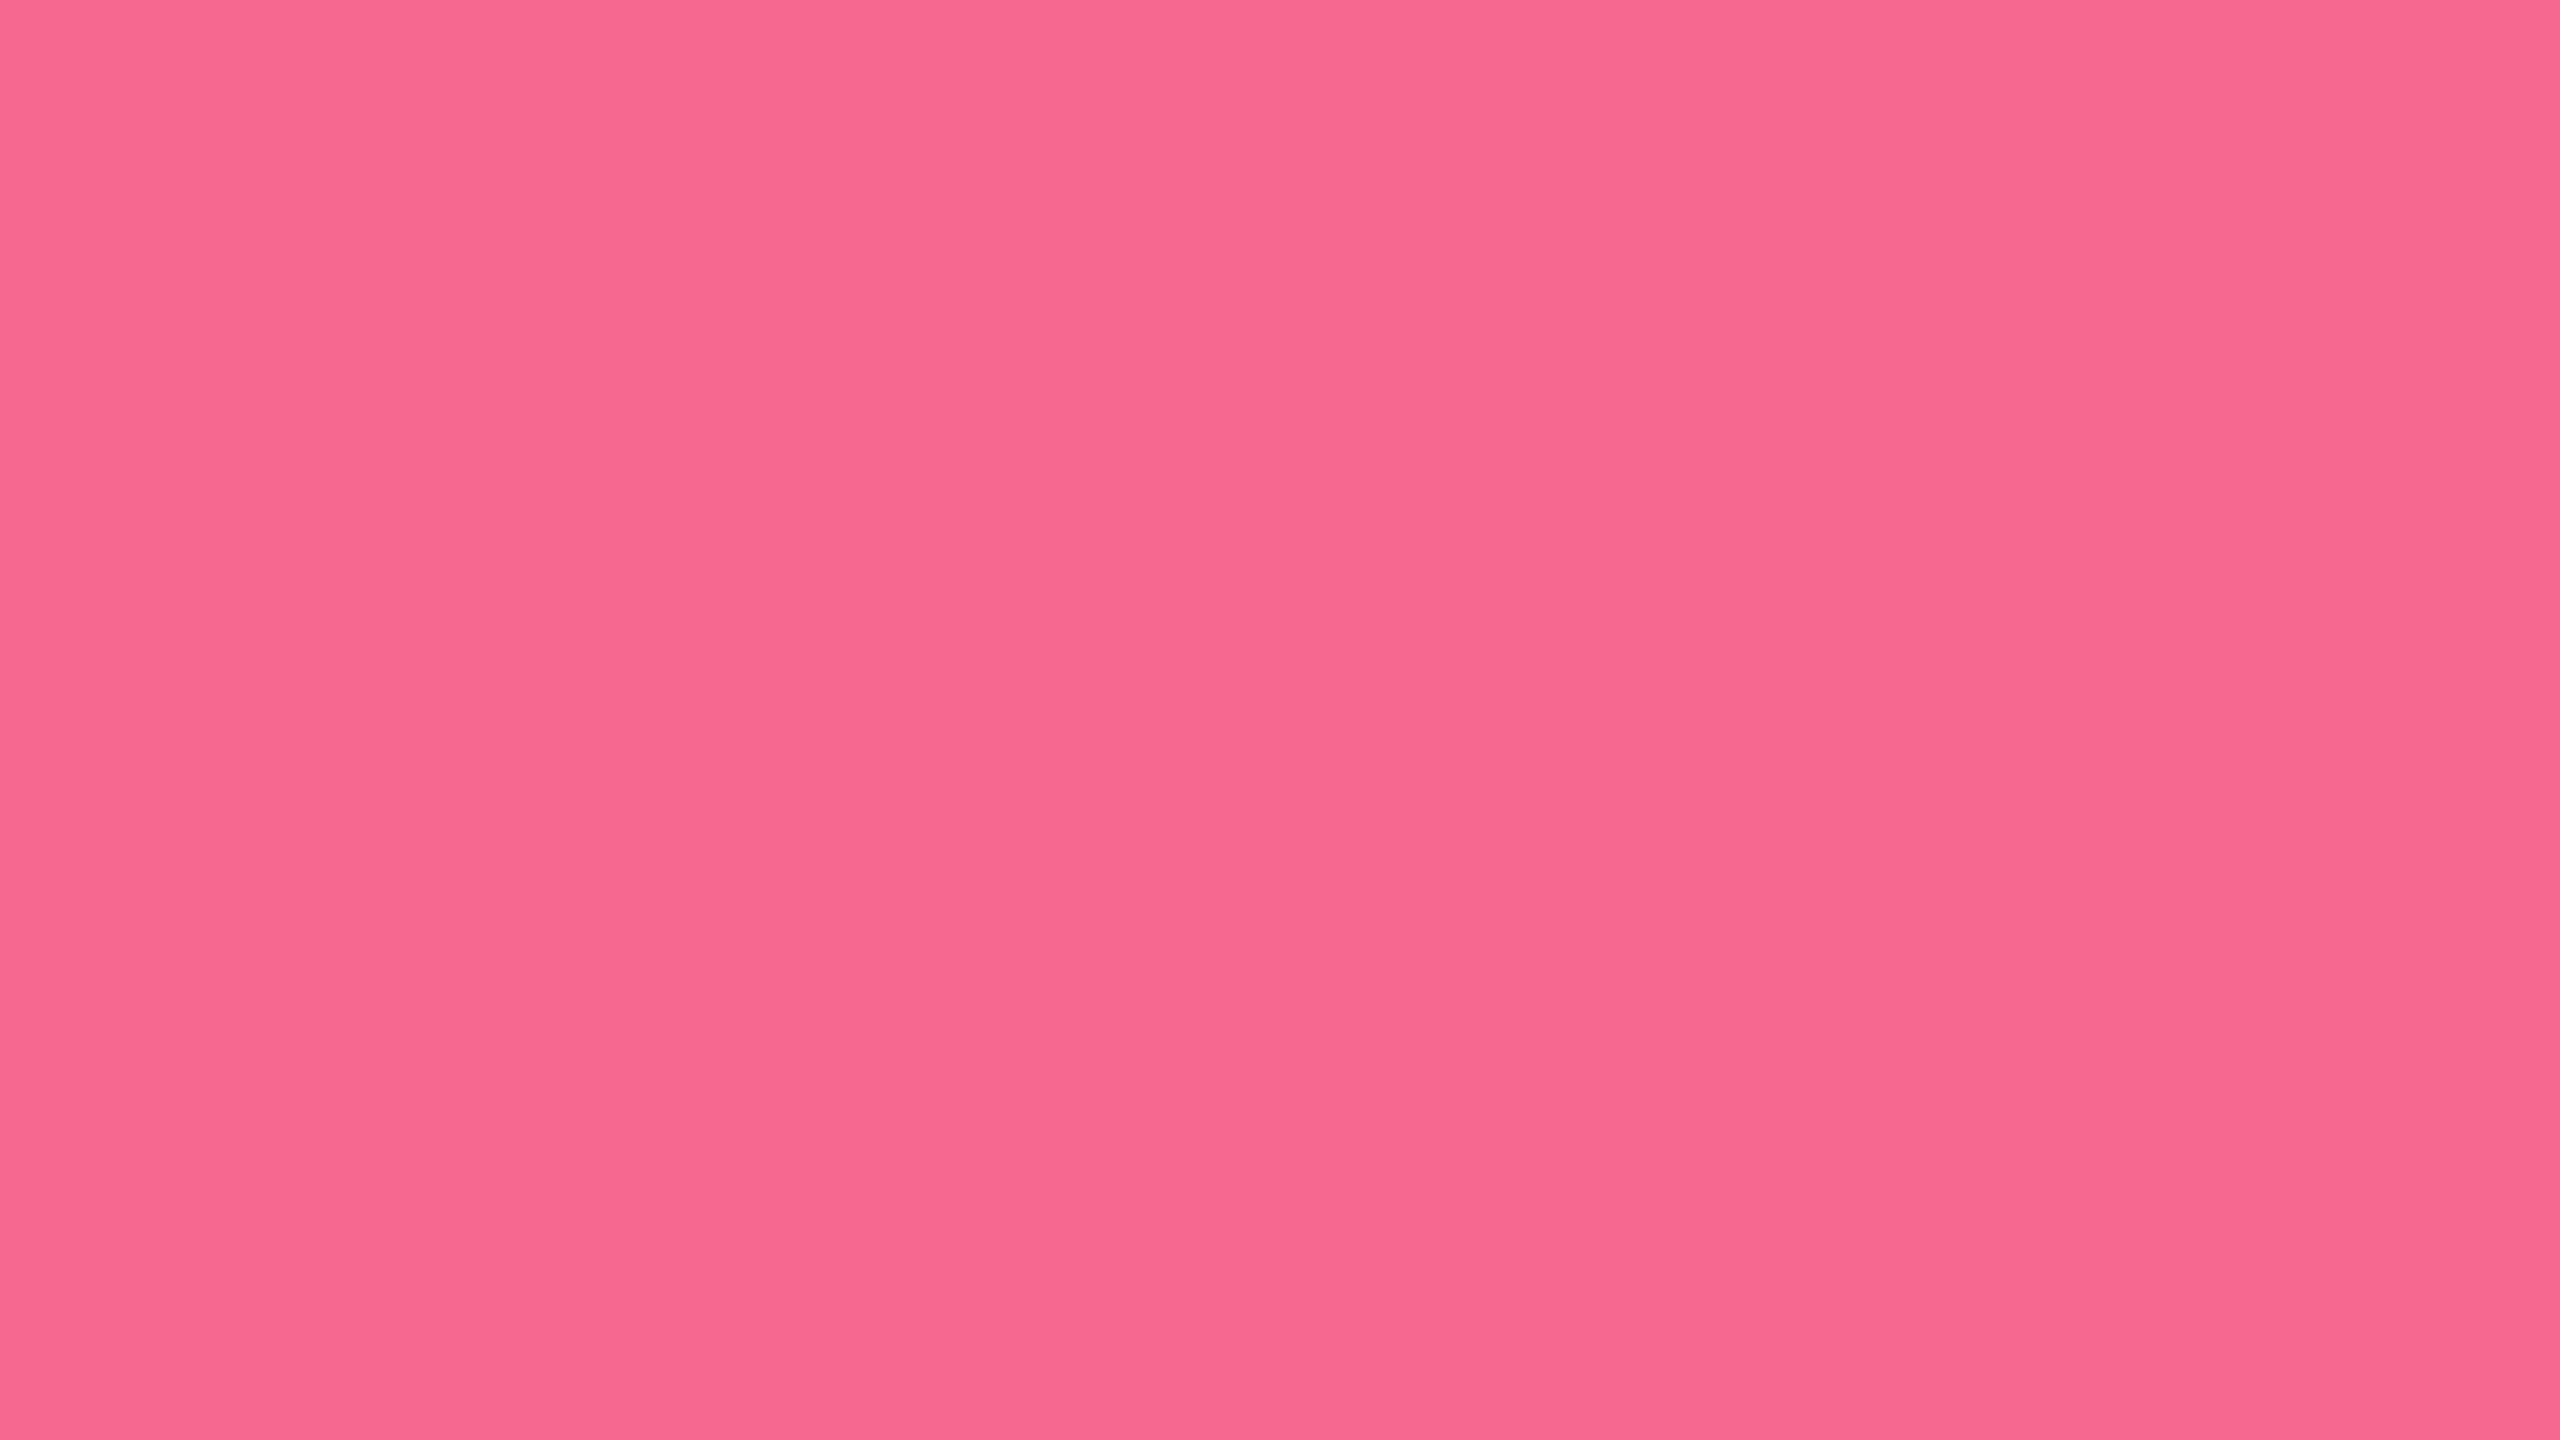 2560x1440 Light Crimson Solid Color Background